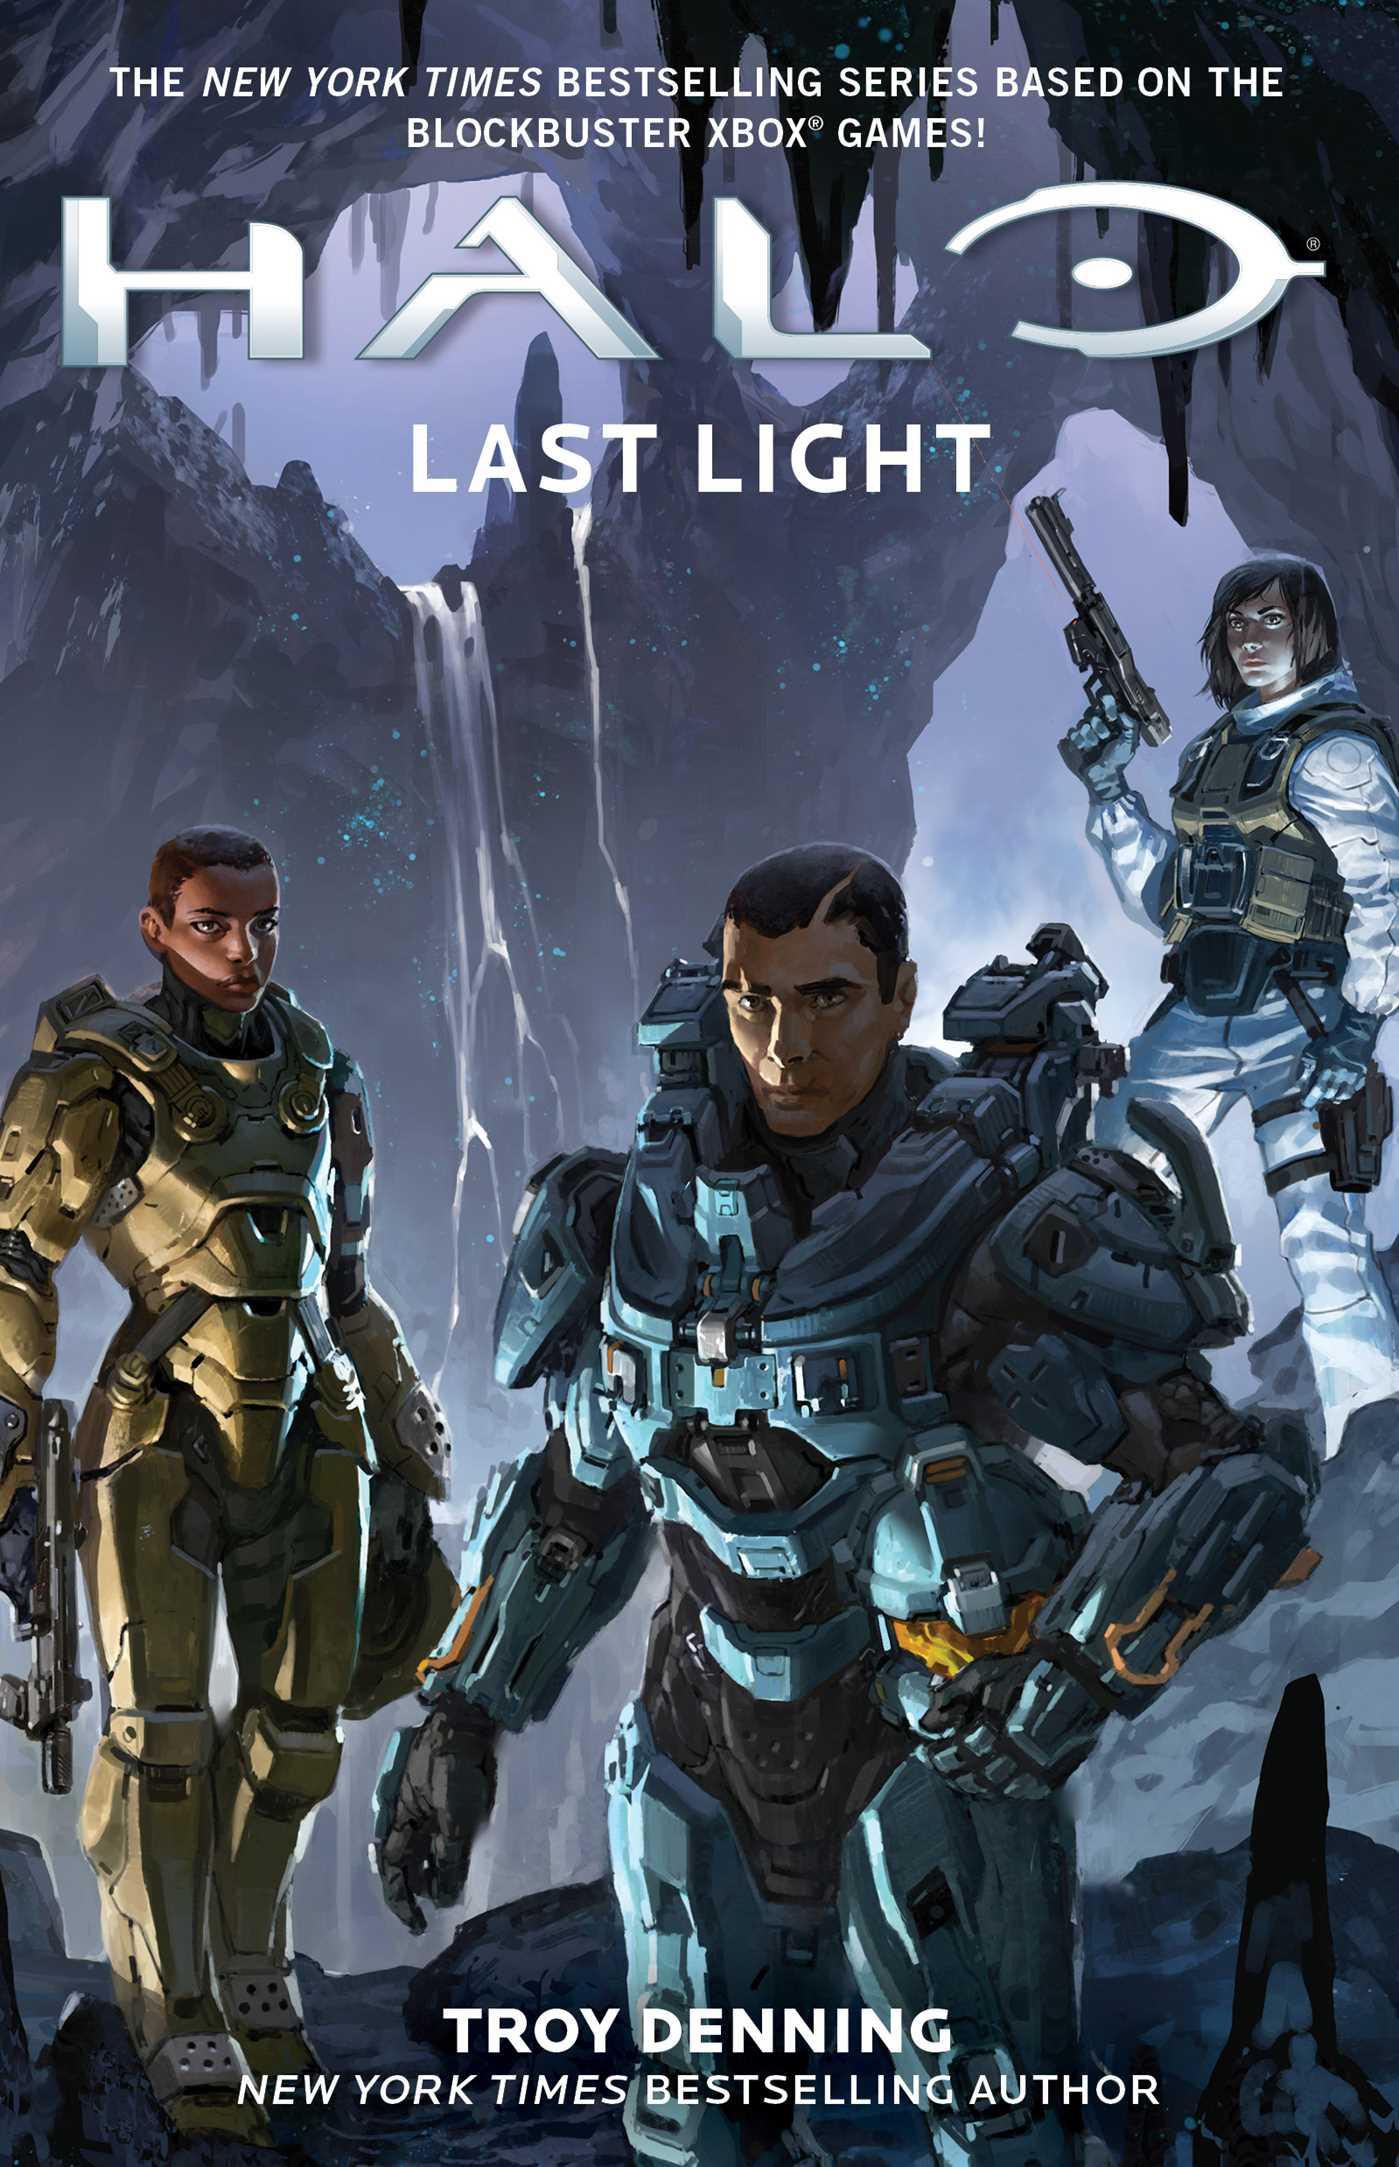 Last light 9781501103377 hr